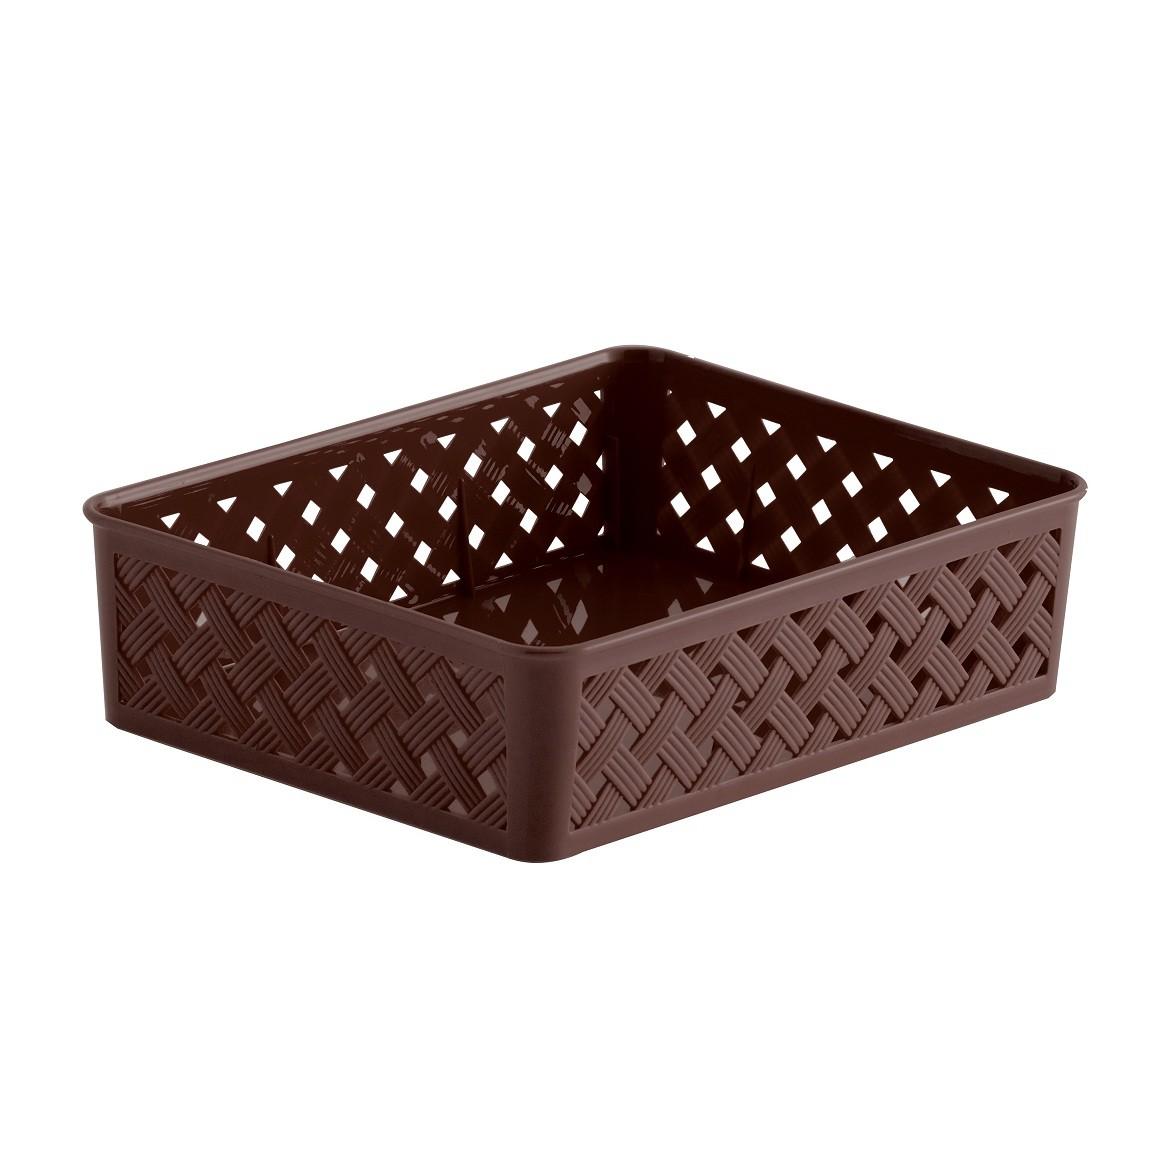 Cesto organizador Rattan chocolate 24x19x6,5